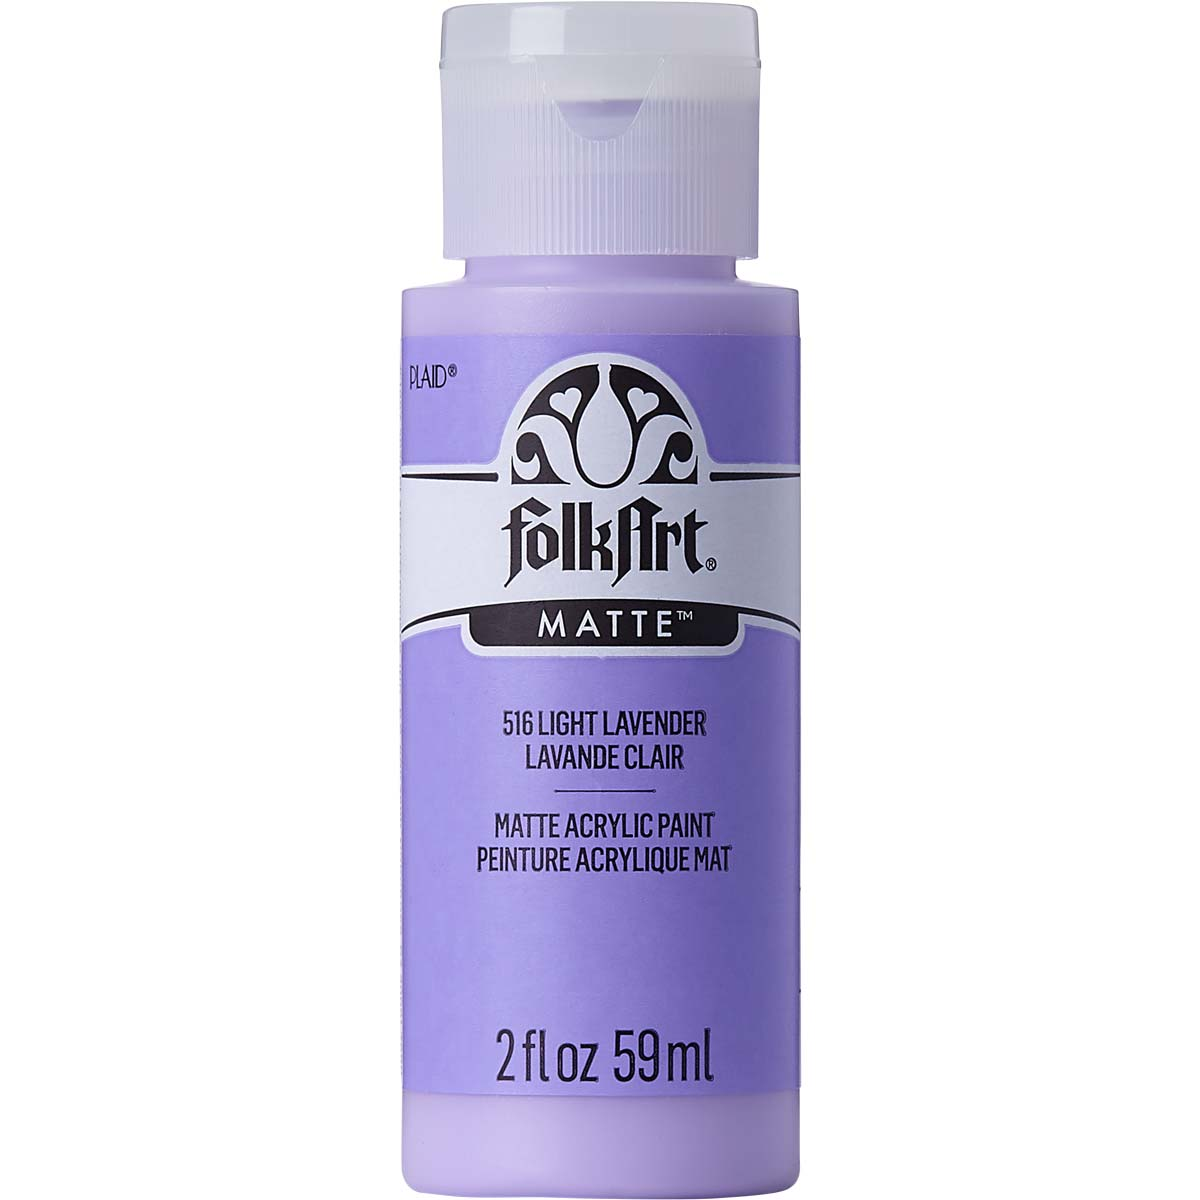 FolkArt ® Acrylic Colors - Light Lavender, 2 oz. - 516